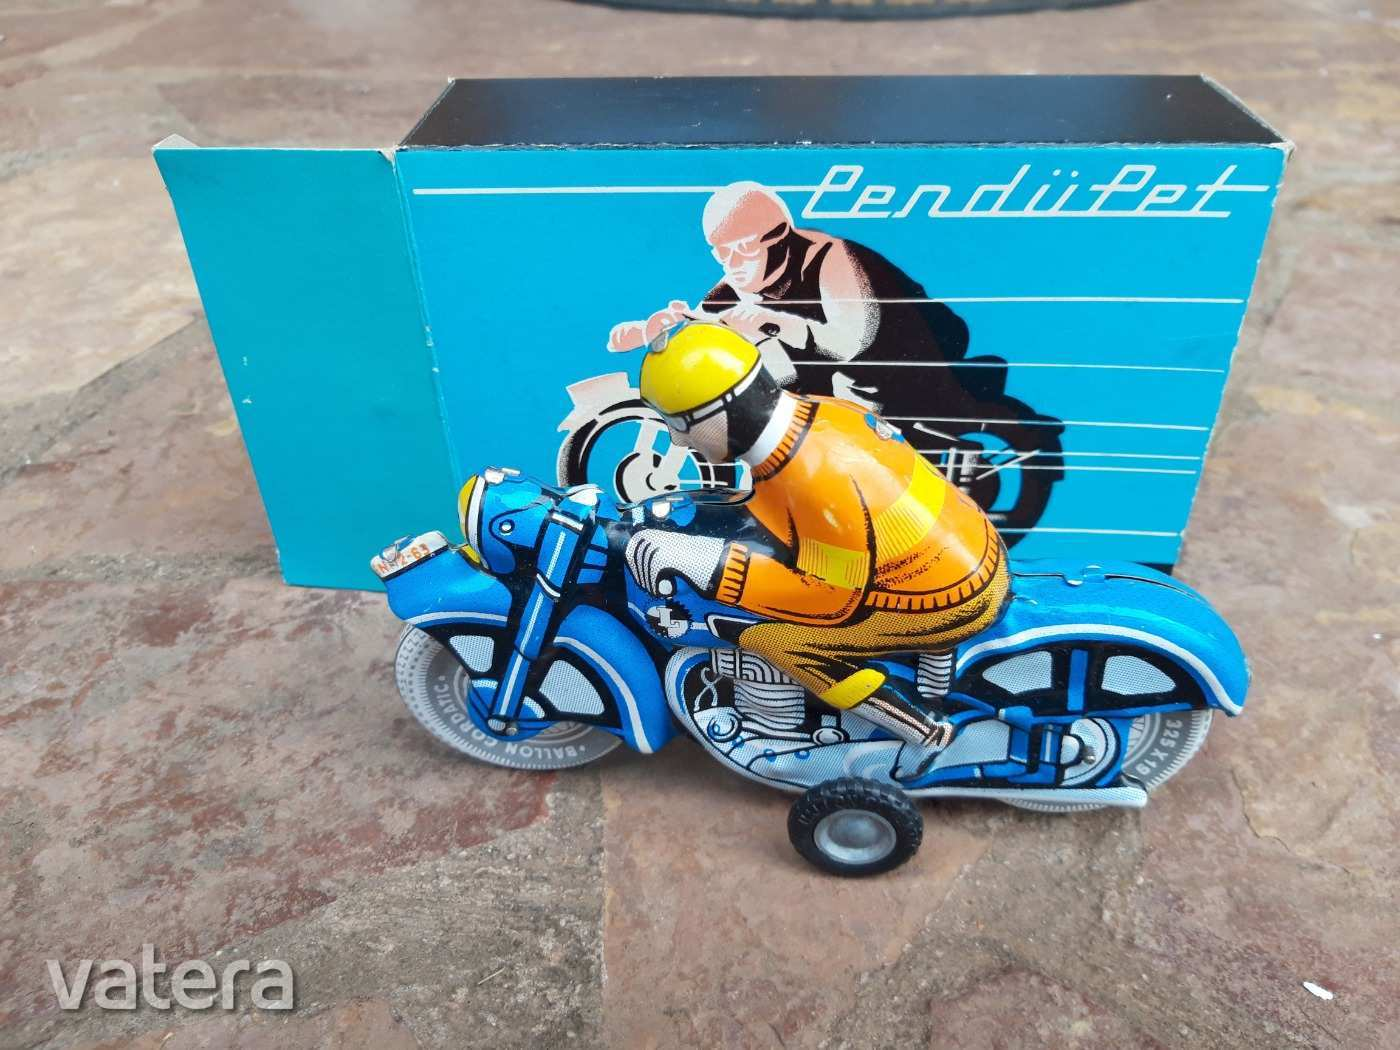 ritka-lemez-motorkerekpar-az-eredeti-dobozaban-c92b_8_big.jpg